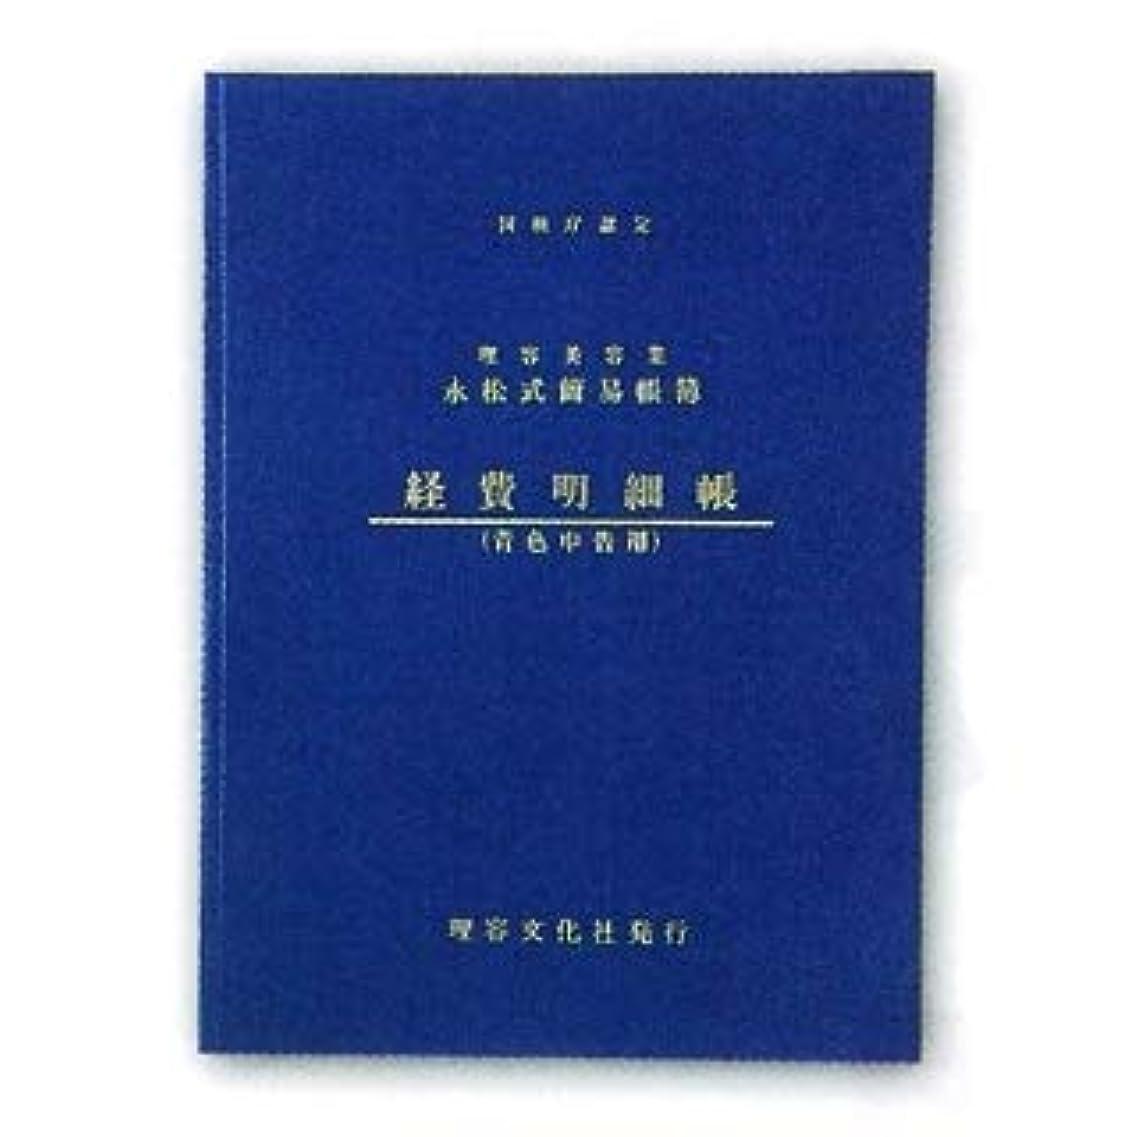 祭司光沢のある純度永松式簡易帳簿 経費明細帳(青色申告用)